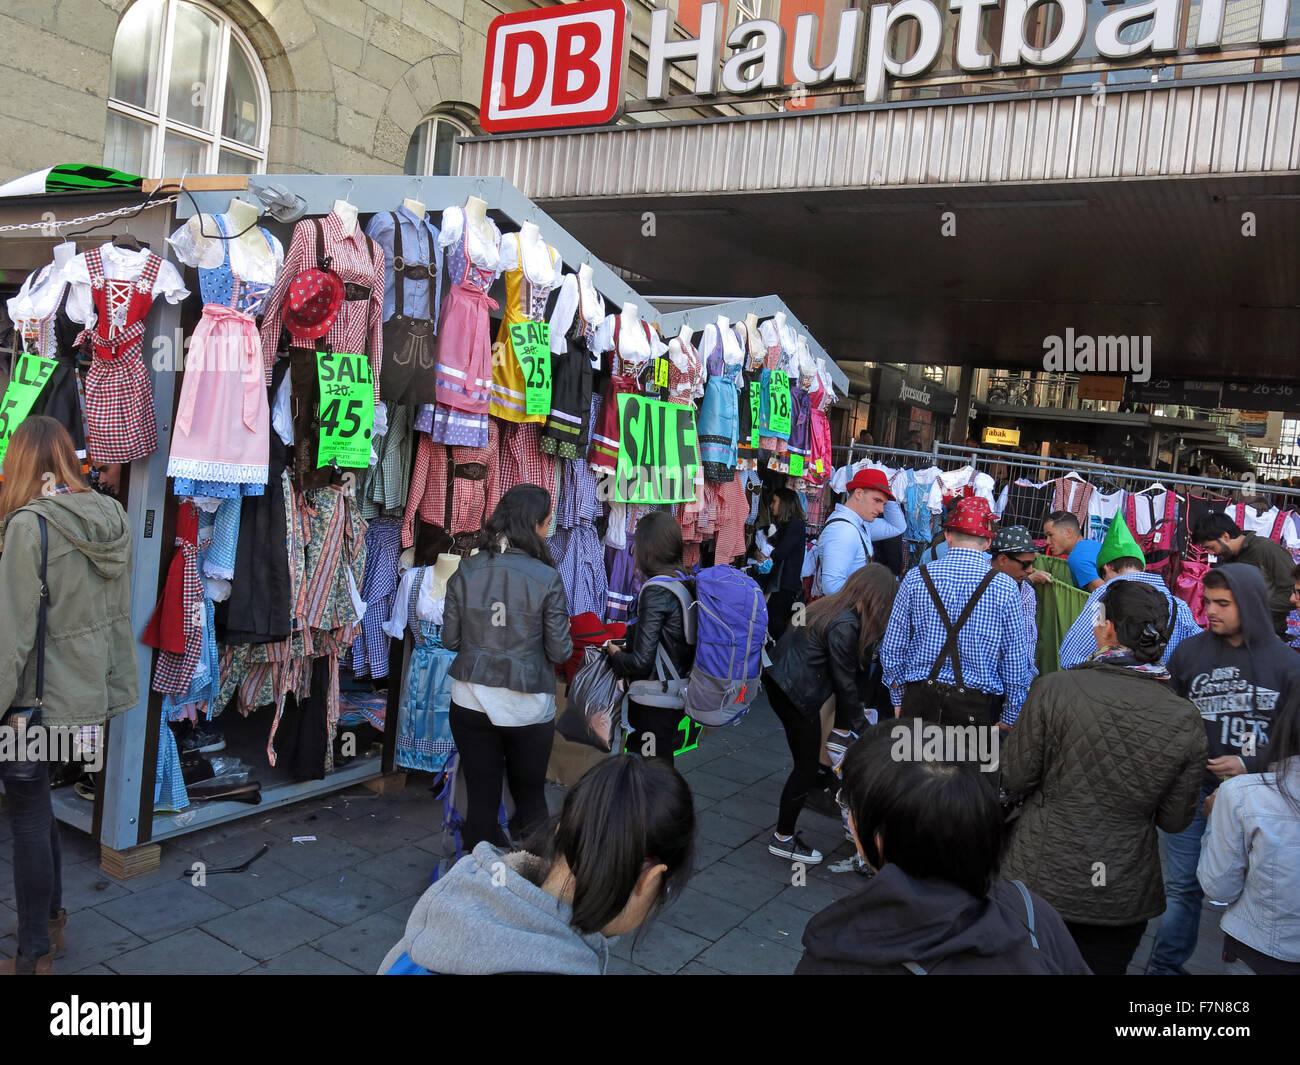 sale,prices,for,sale,reduced,Octoberfest,beer,bier,festival,railway,station,gear,Hbf,central,stall,market,price,prices,Bavarian,lederhosen,hat,tourist,tourists,Dirndl,leather,Bundhosen,Kniebundhosen,traditional,clothing,clothes,Alpine,dress,skirt,For Sale,GoTonySmith,Munich,Oktoberfest,in,Germany,Volksfest,beer,festival,and,travelling,funfair,Bavaria,event,Wiesn,fairgrounds,Octoberfest,October,Autumn,Theresienwiese,field,or,meadow,of,Therese,centre,beer,center,bier,roast,pork,chicken,building,buildings,Brezen,pretzels,Knödel,potato,bread,dumplings,Käsespätzle,Reiberdatschi,pancake,Sauerkraut,or,Rotkohl,Blaukraut,ale,Dirndl,Lederhosen,Sennerhut,tent,Buy Pictures of,Buy Images Of,Unity Day,Oktoberfest beer,Beer festival